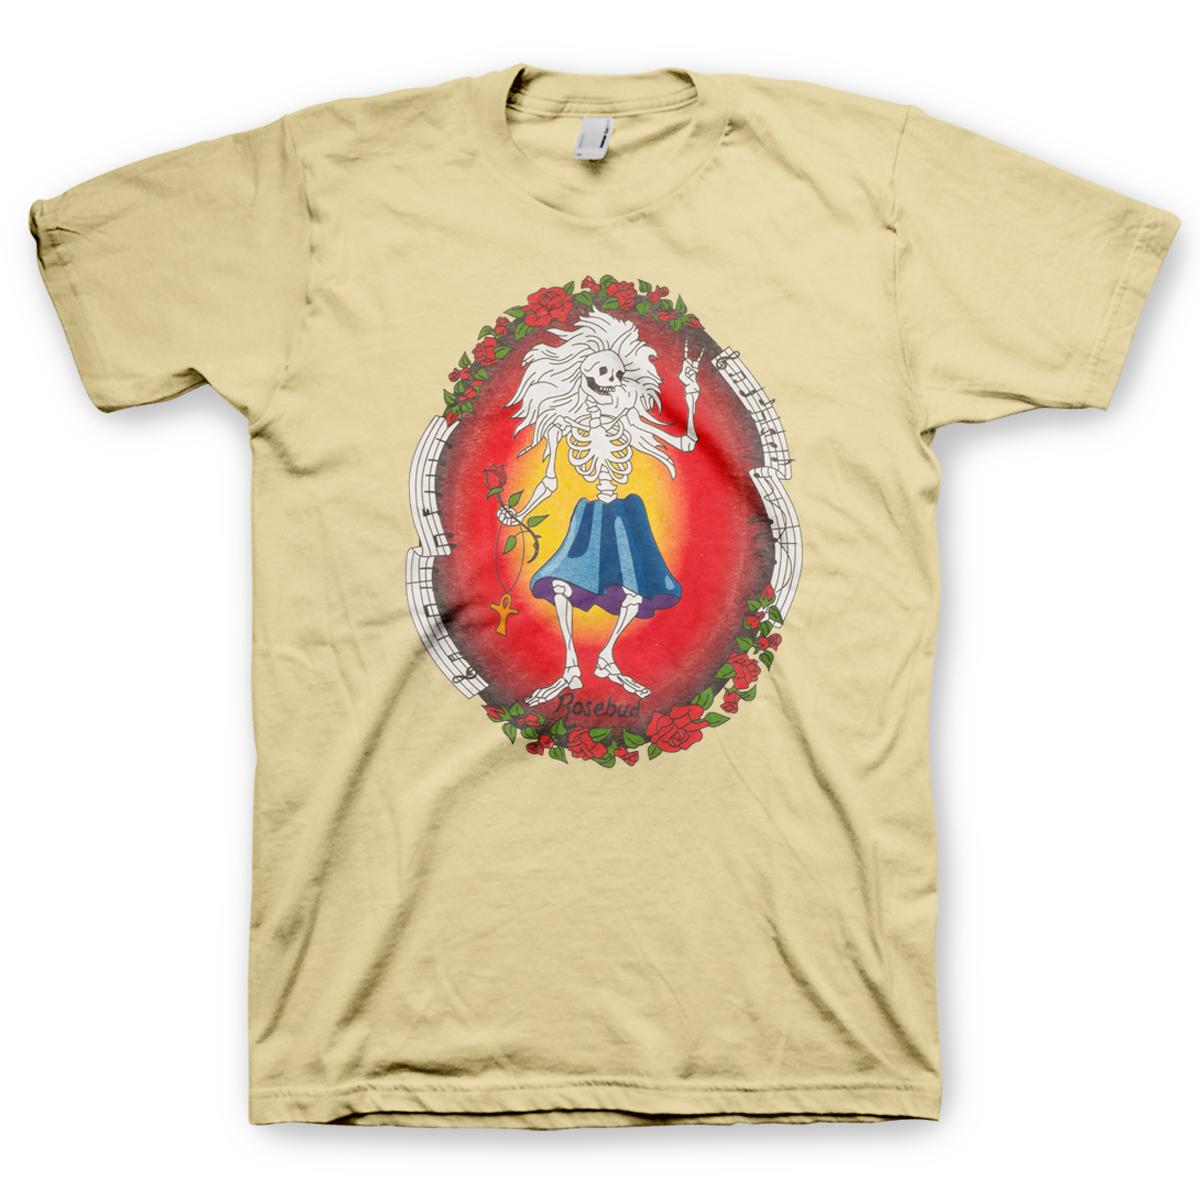 Jerry garcia rosebud t shirt shop the jerry garcia official store jerry garcia rosebud t shirt buycottarizona